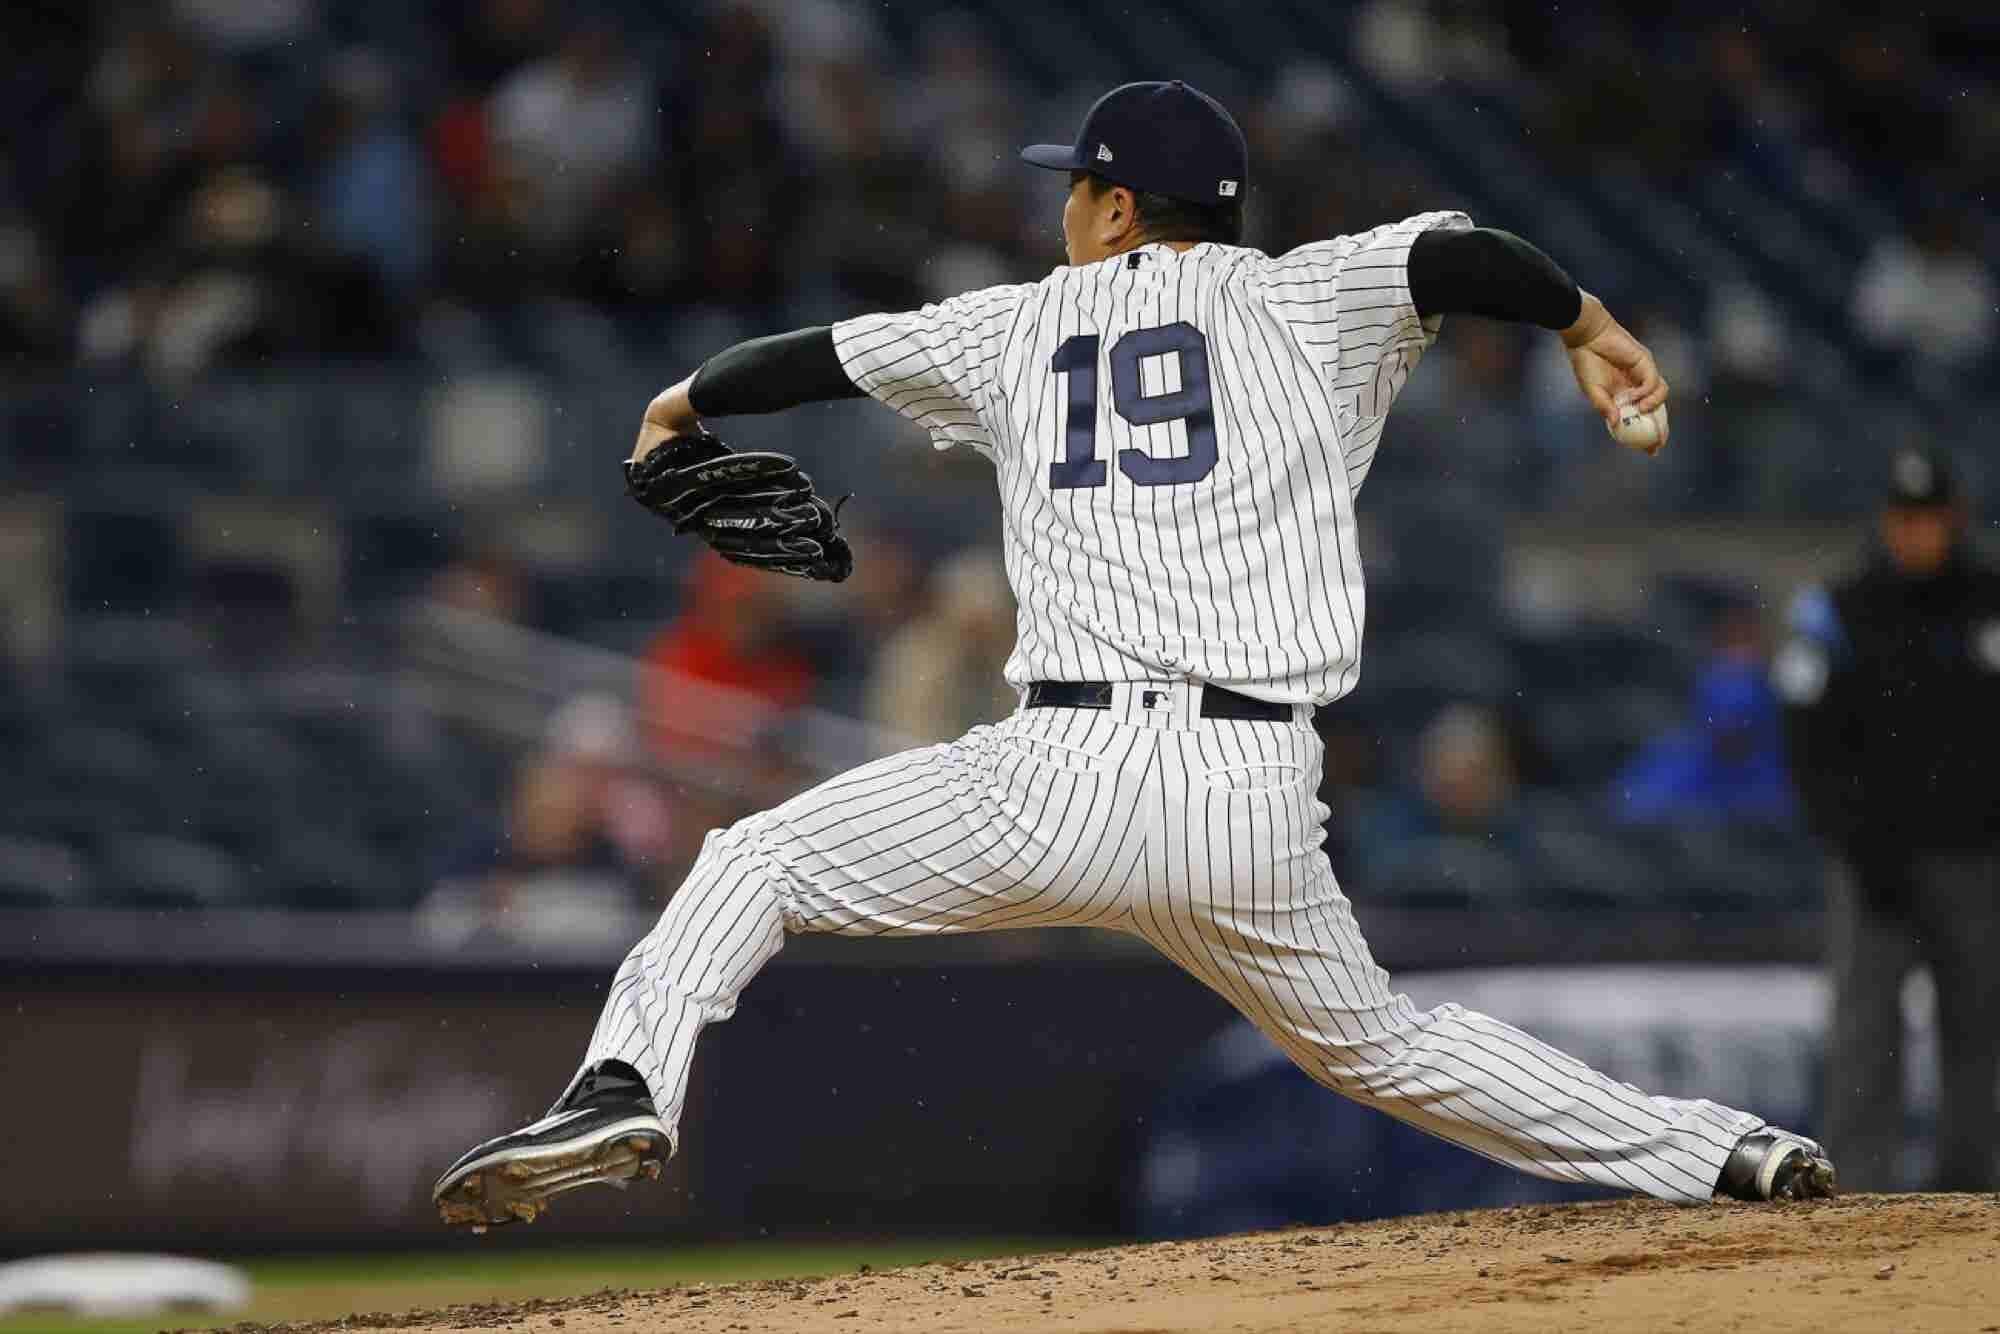 How to Break Out of a Major League Slump